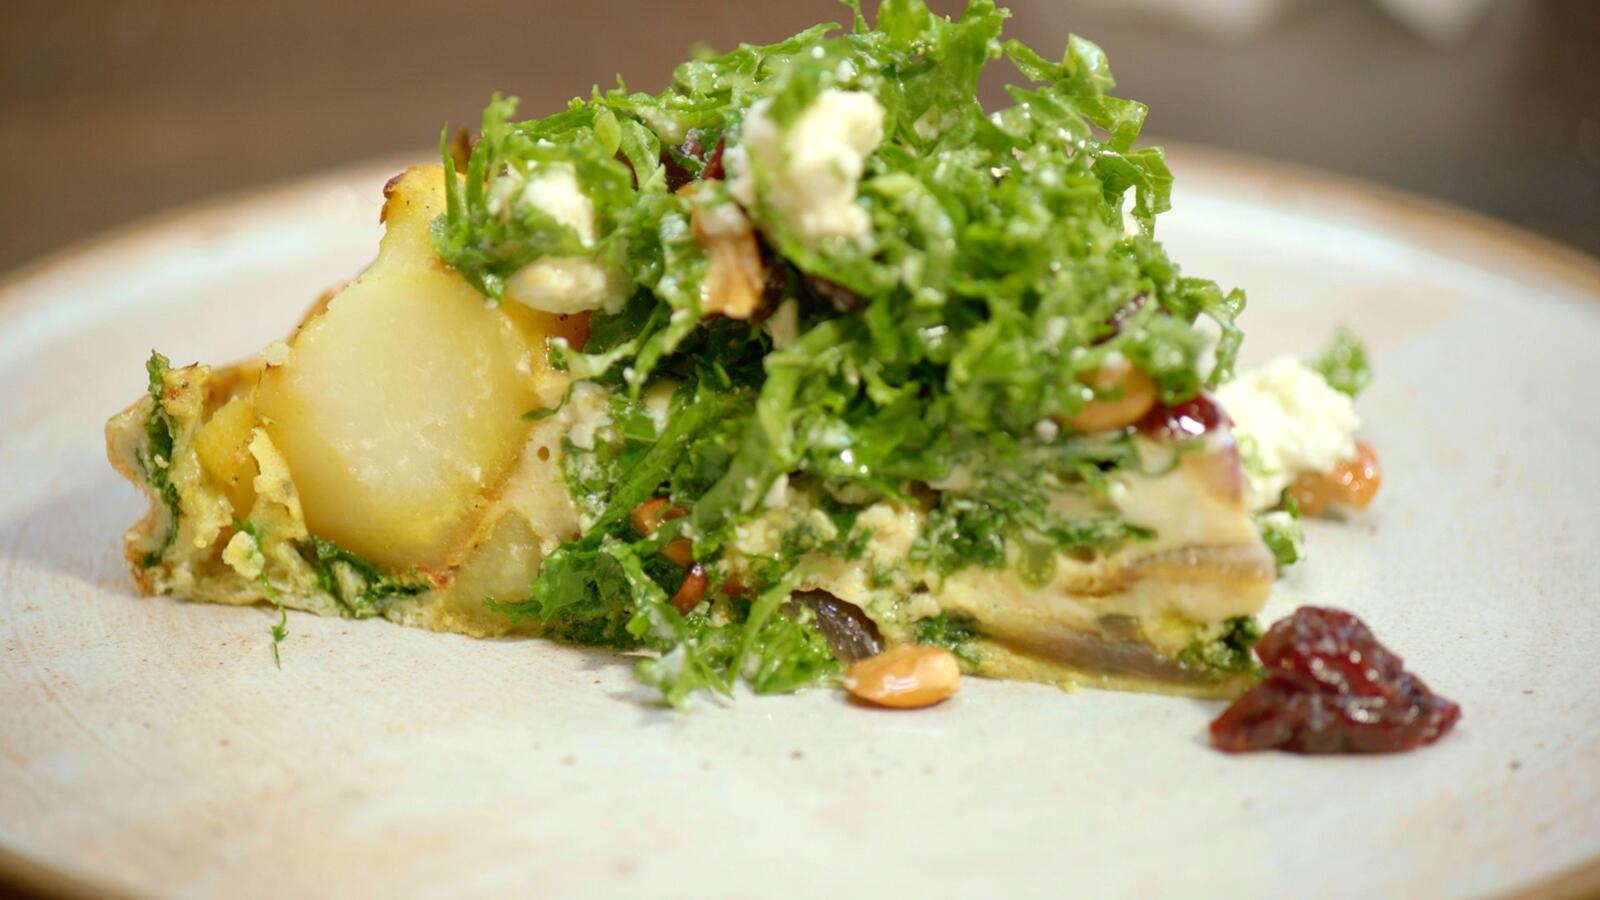 Frittata met aardappel en boerenkool